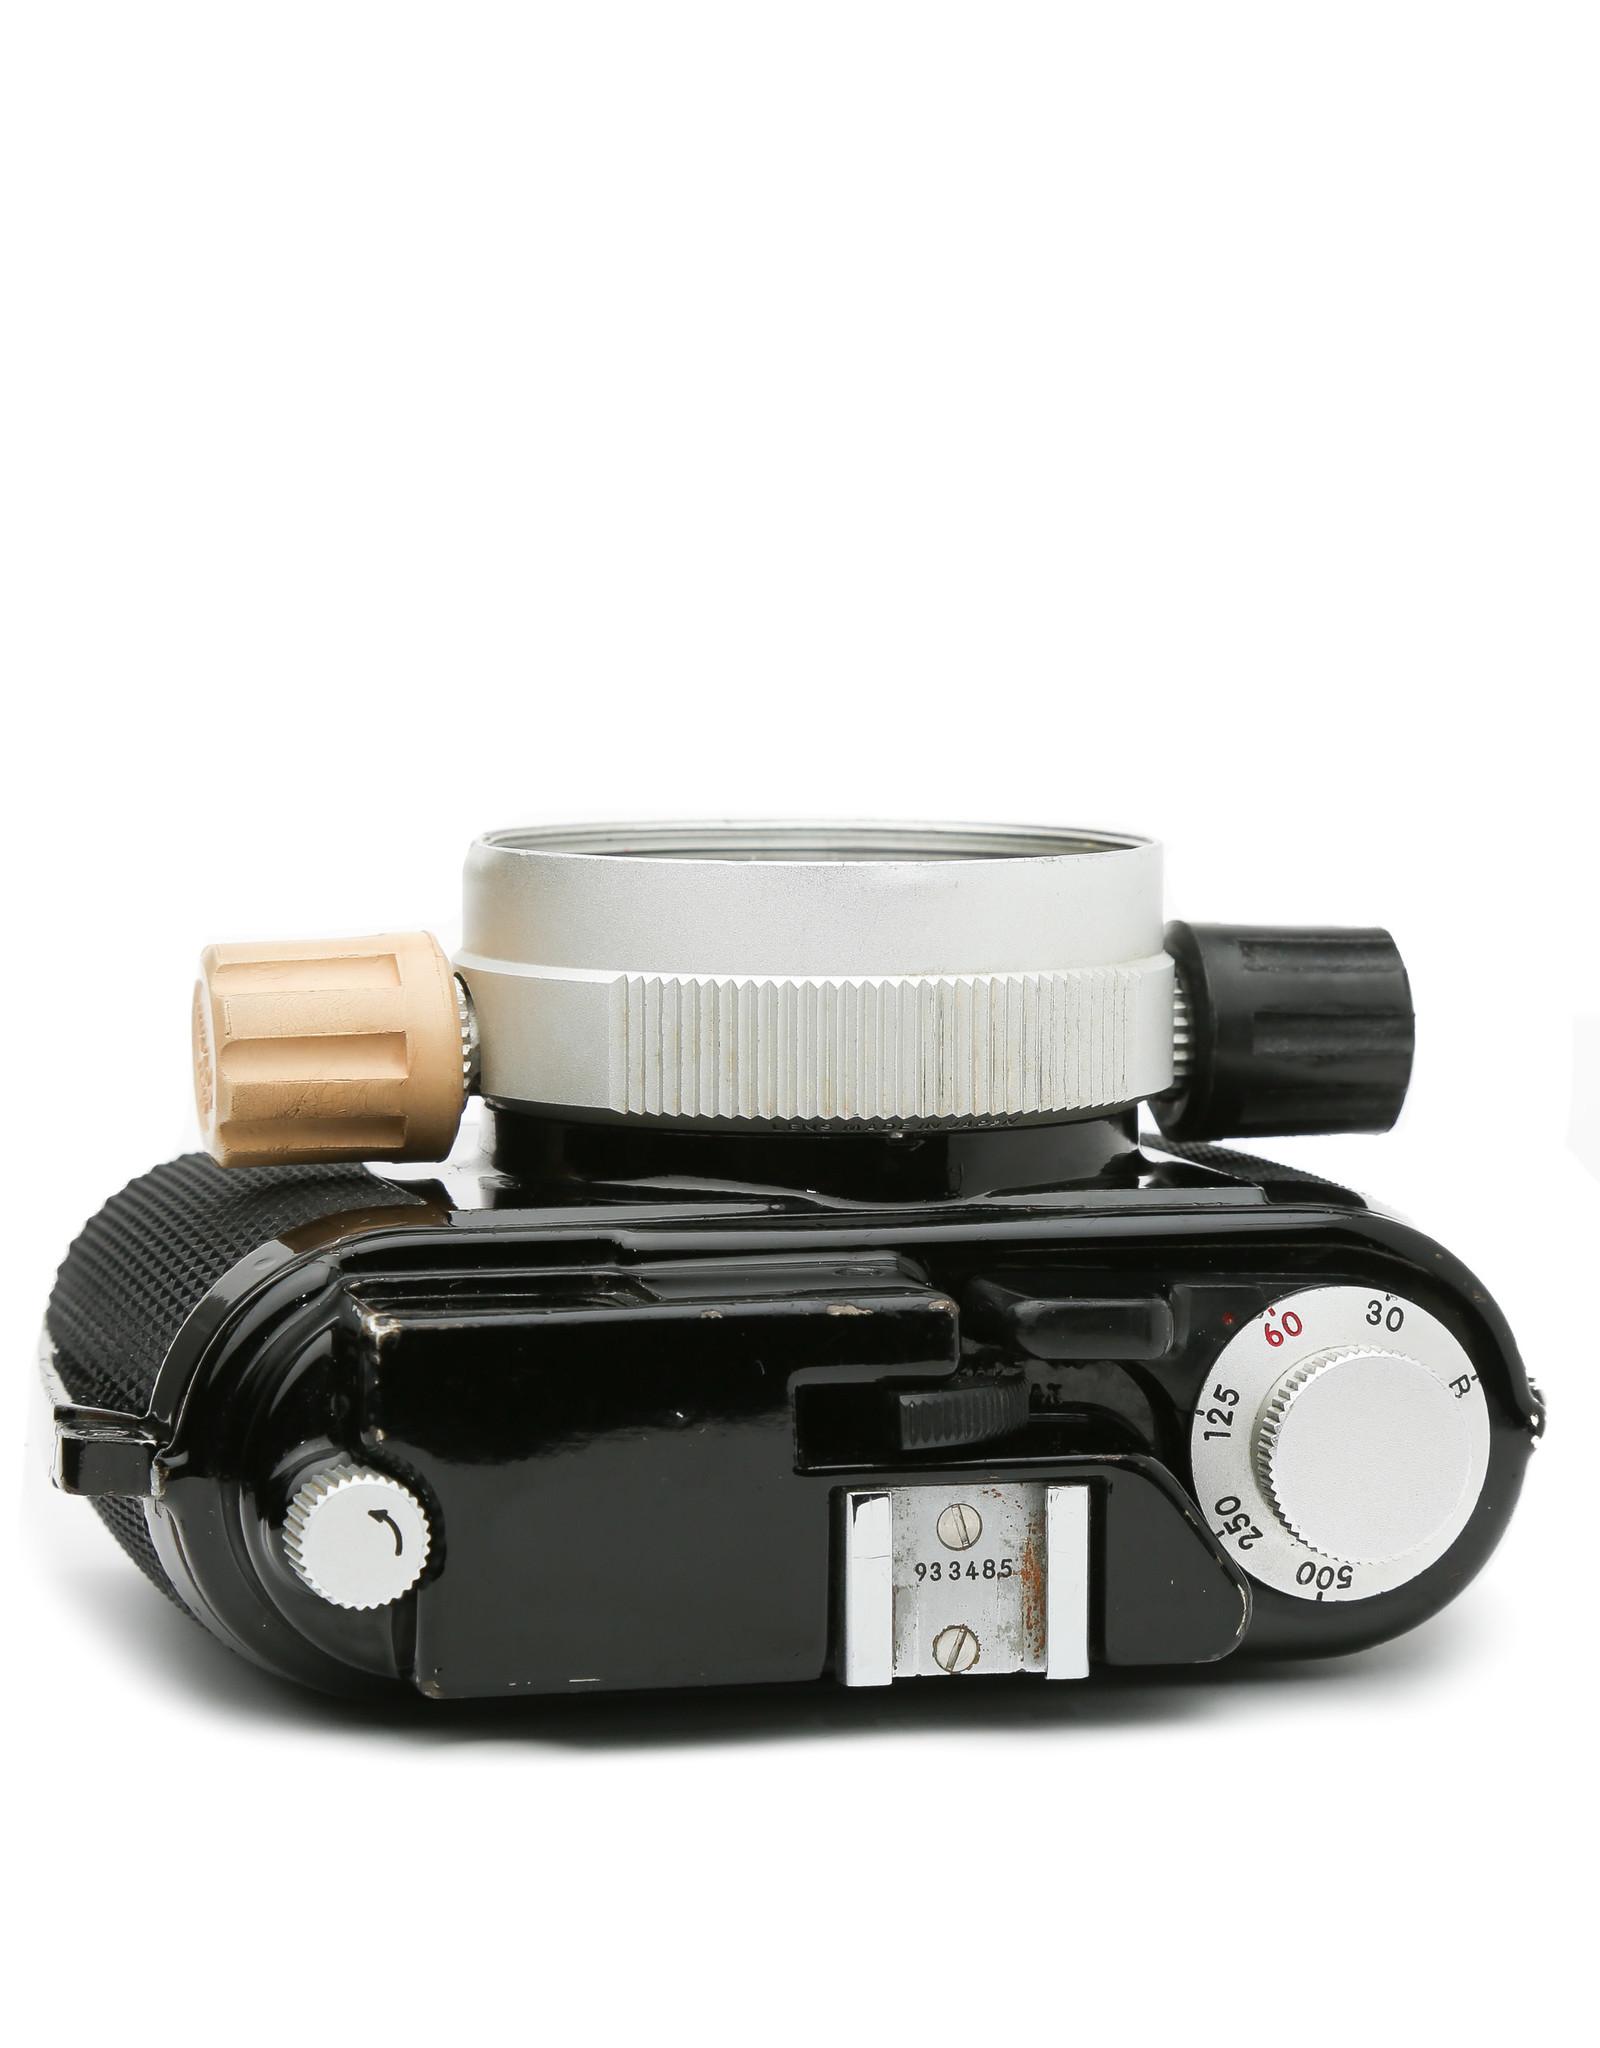 Nikon Nikon Nikonos I Underwater Camera w/35mm f2.8